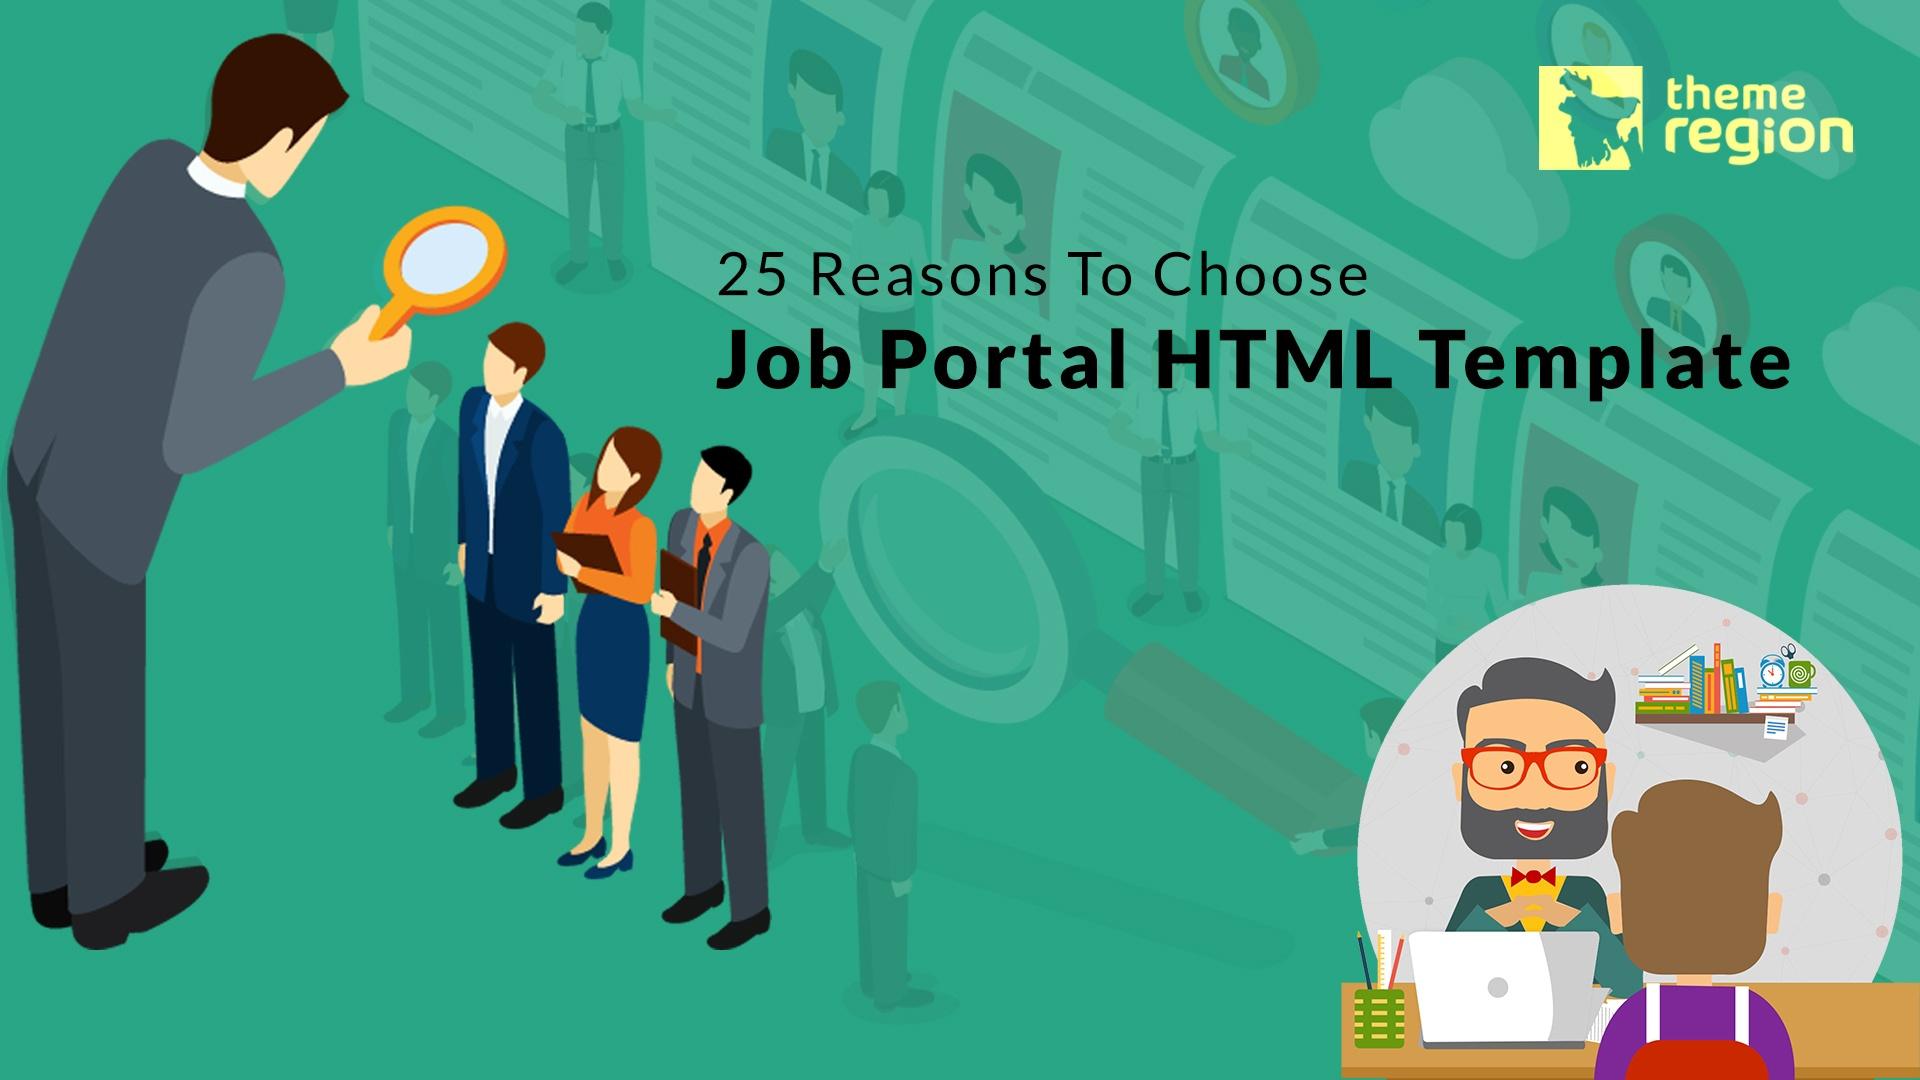 25 Reasons To Choose Job Portal HTML Template- Don't Miss The Bonus Part